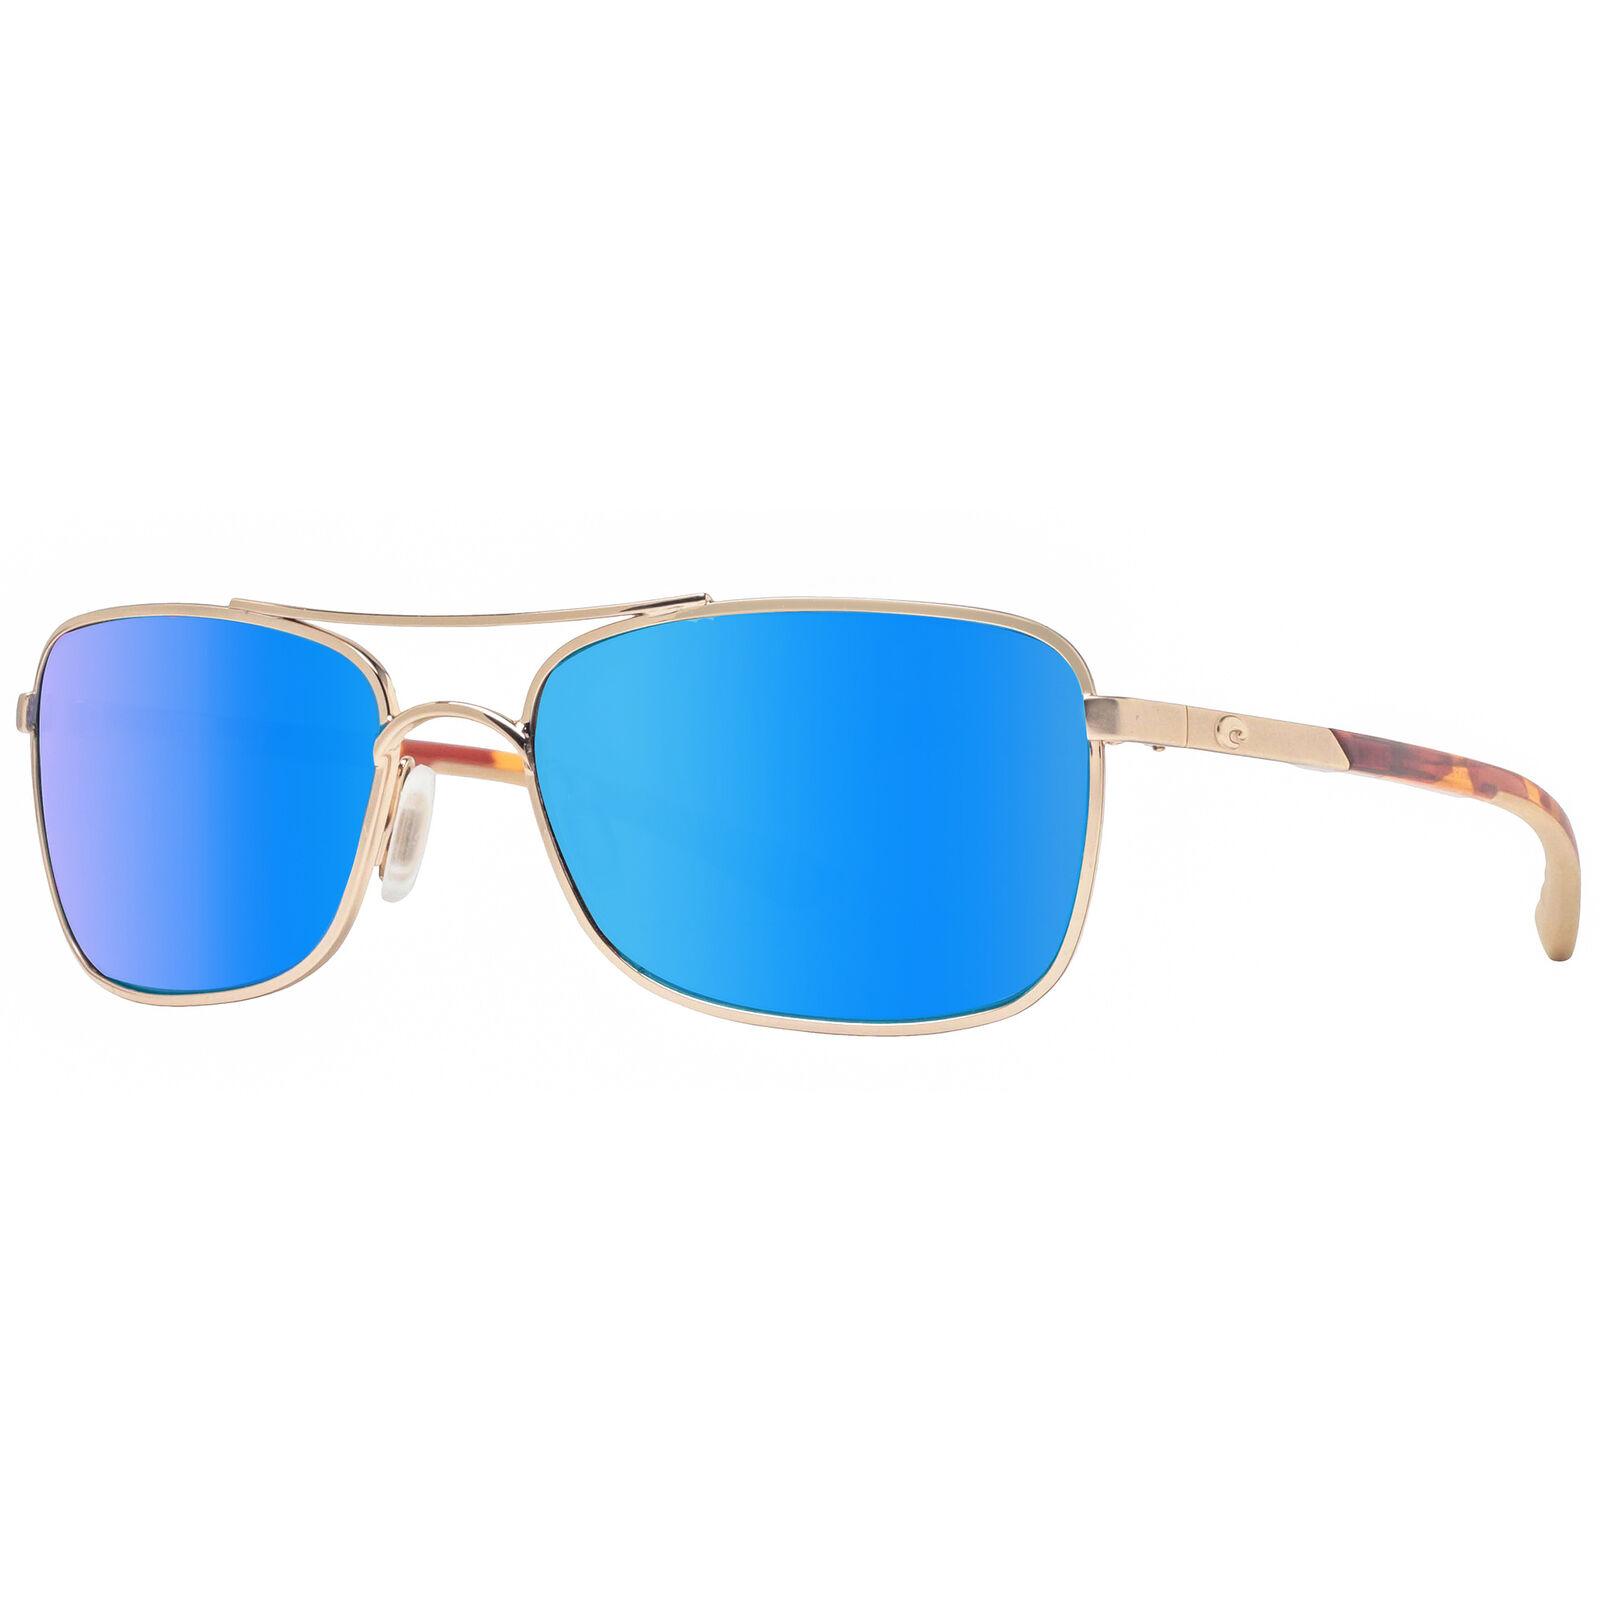 87a27bdb90 Costa Del Mar Palapa AP64 OBMGLP Rose Gold Blue Mirror Polarized 580G  Sunglasses